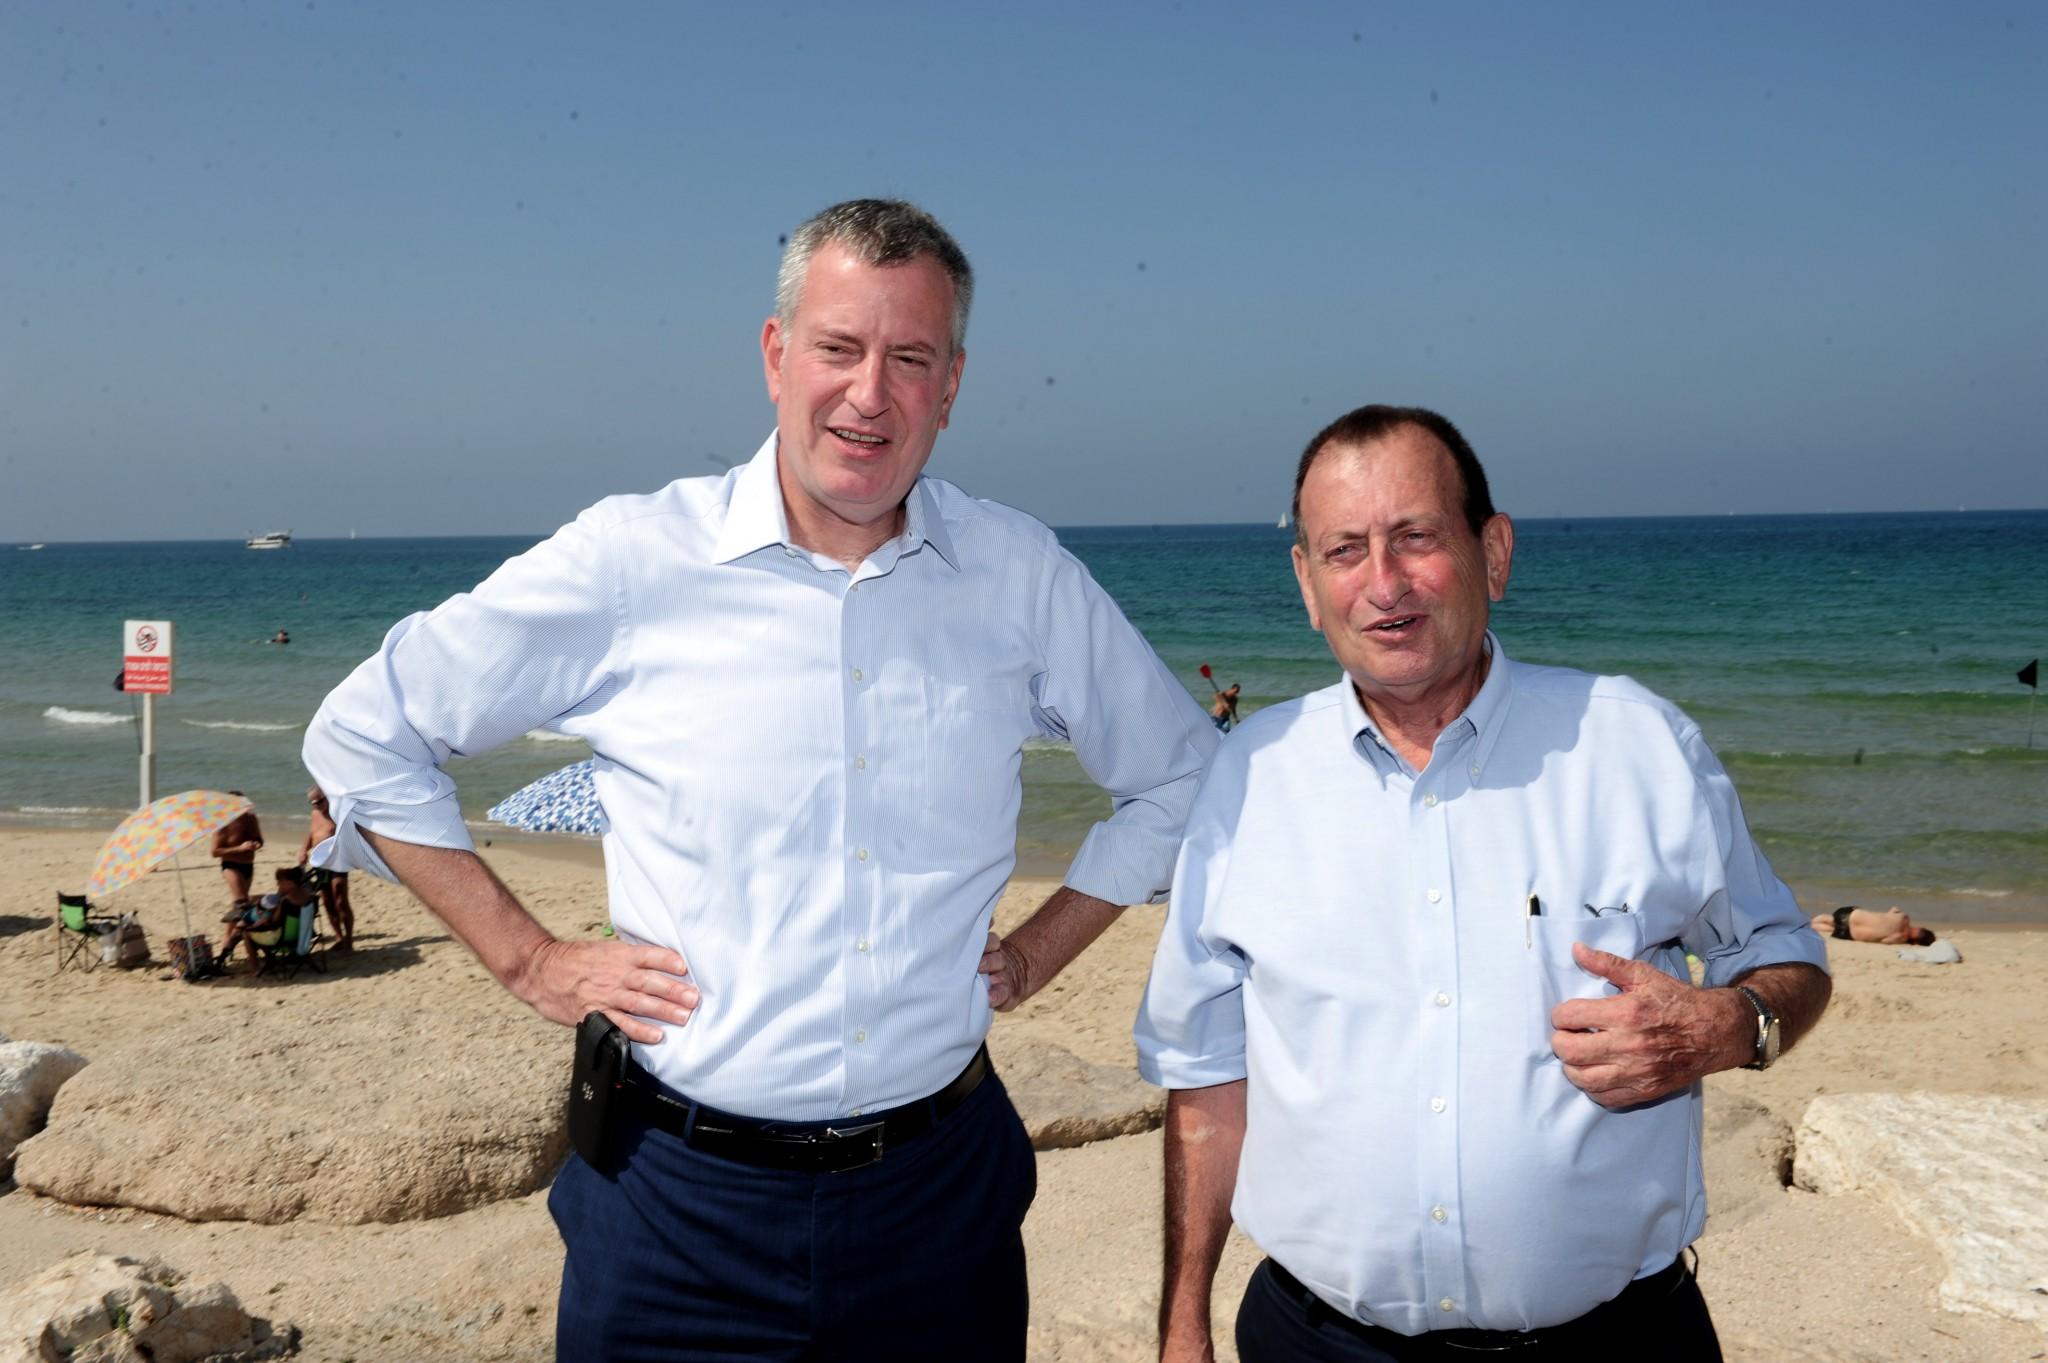 Ron Huldai, Mayor of Tel Aviv-Yafo, hosts Bill De Blasio, Mayor of New York City. Photo by Kfir Sivan